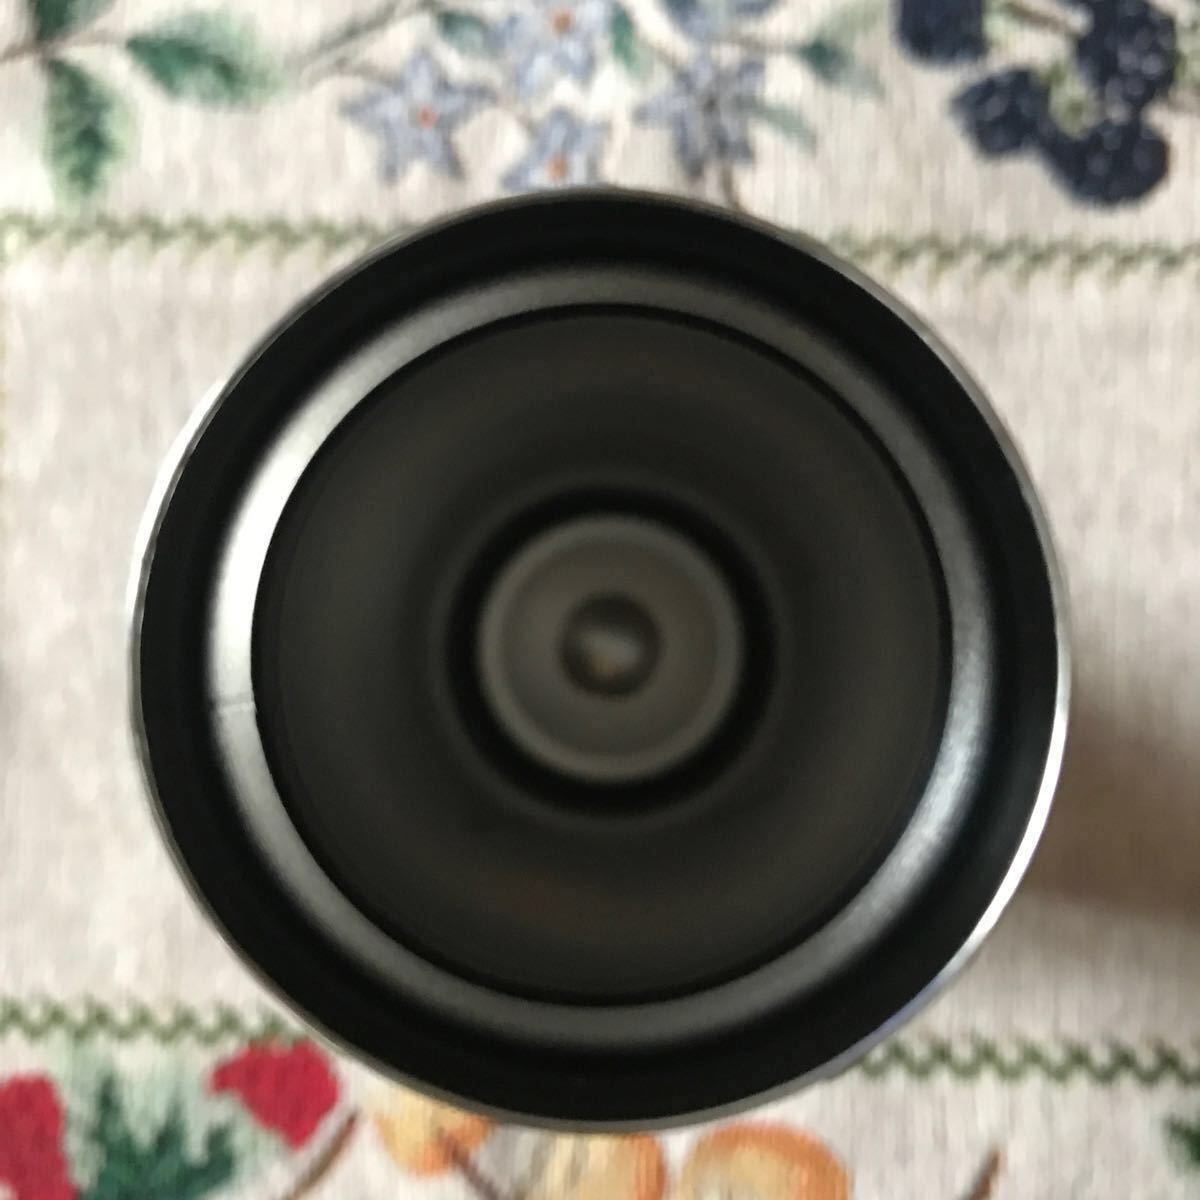 ◆THERMOSサーモス/真空断熱保温保冷水筒スリムボトルJNI-400(BK) 400ml